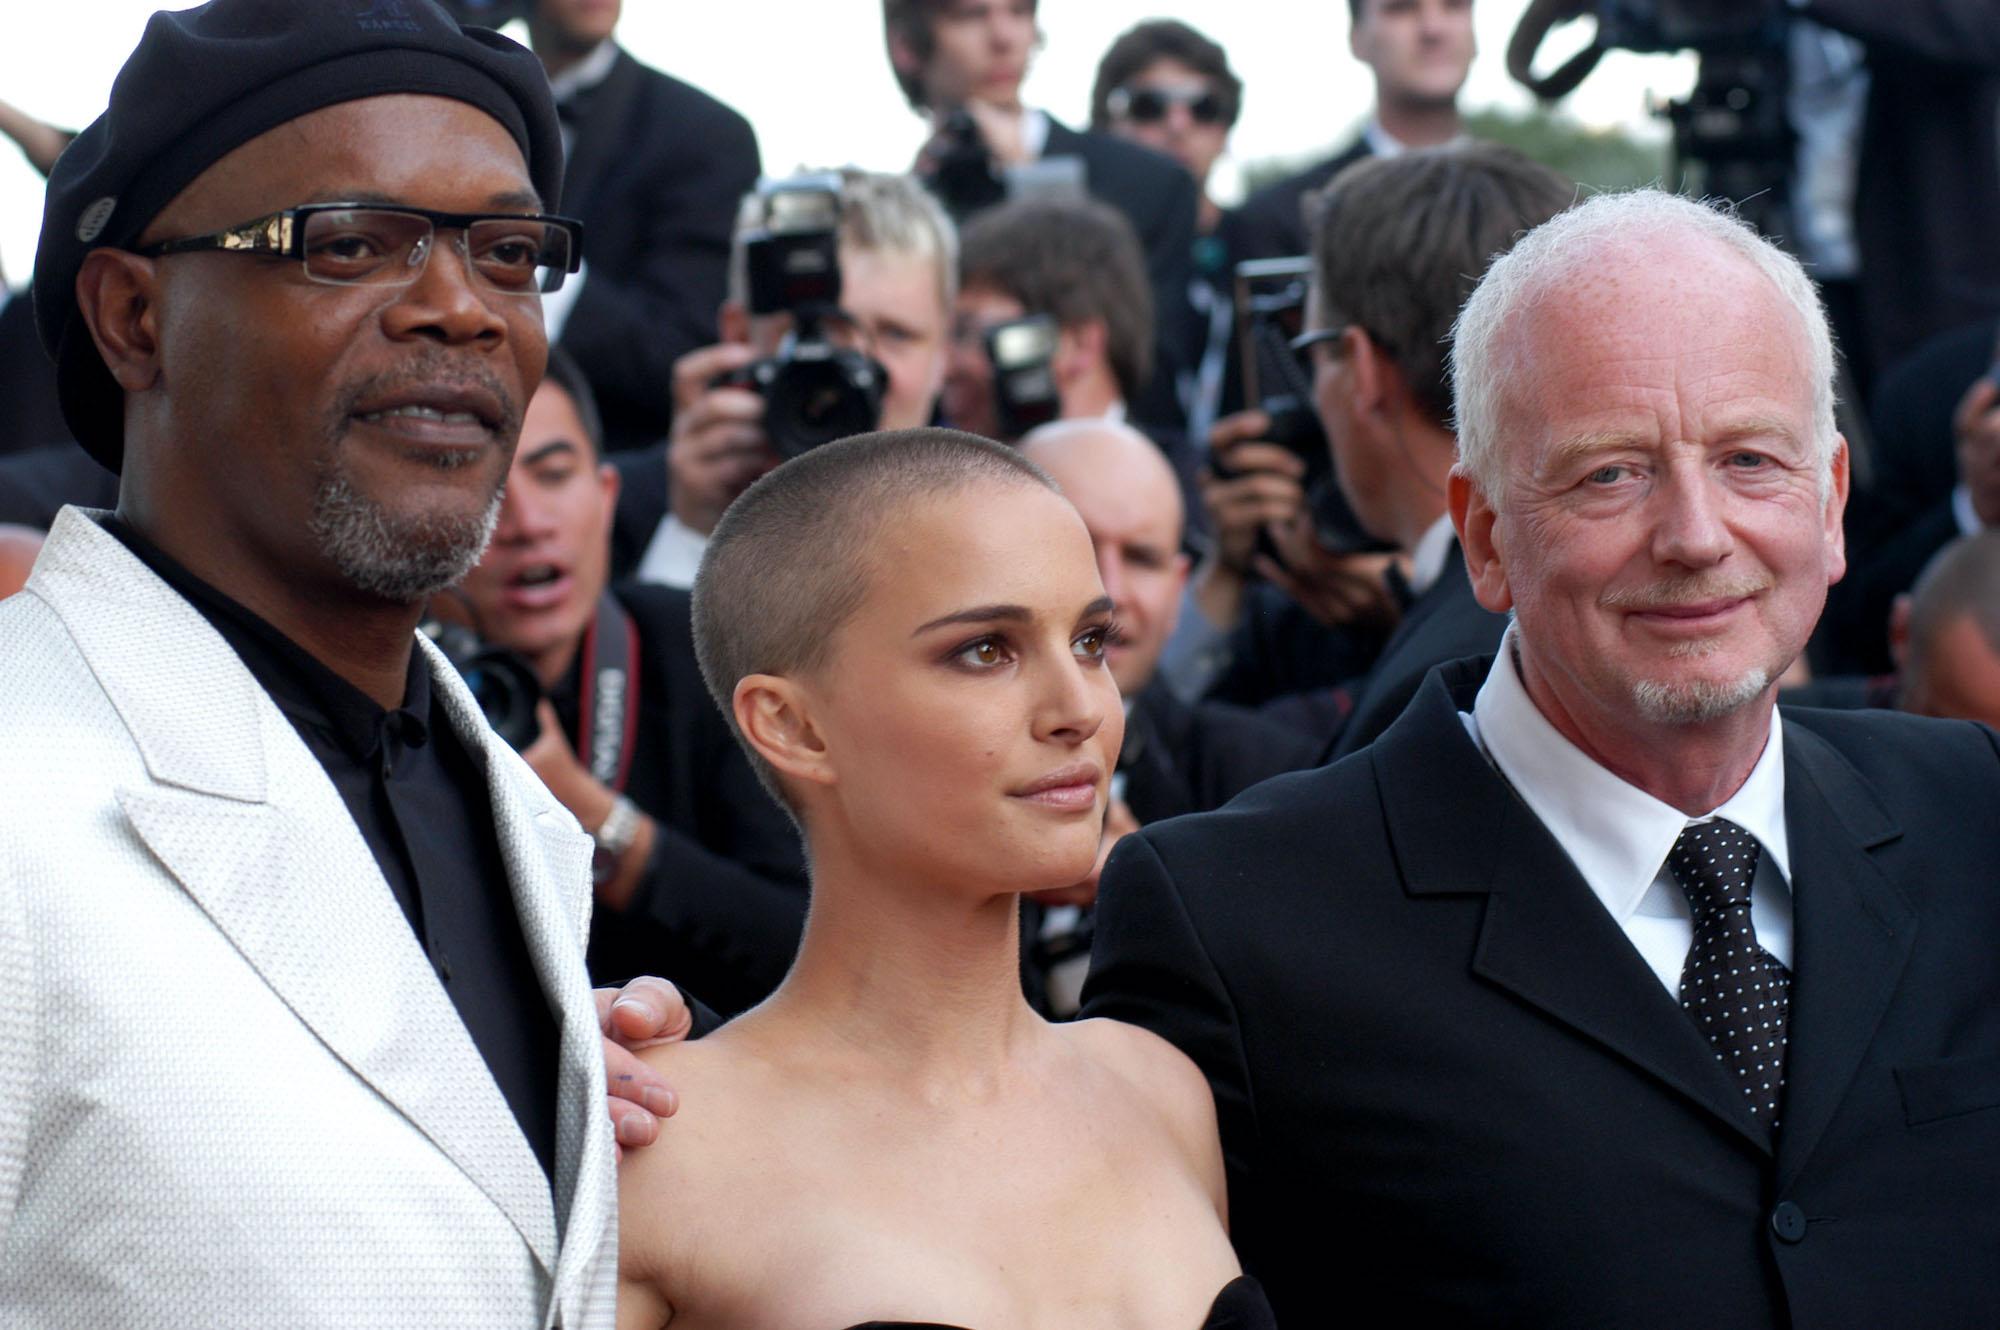 "Samuel L. Jackson, Natalie Portman, Ian McDiarmid during 2005 Cannes Film Festival - ""Star Wars Episode III - Revenge of the Sith"" Premiere"